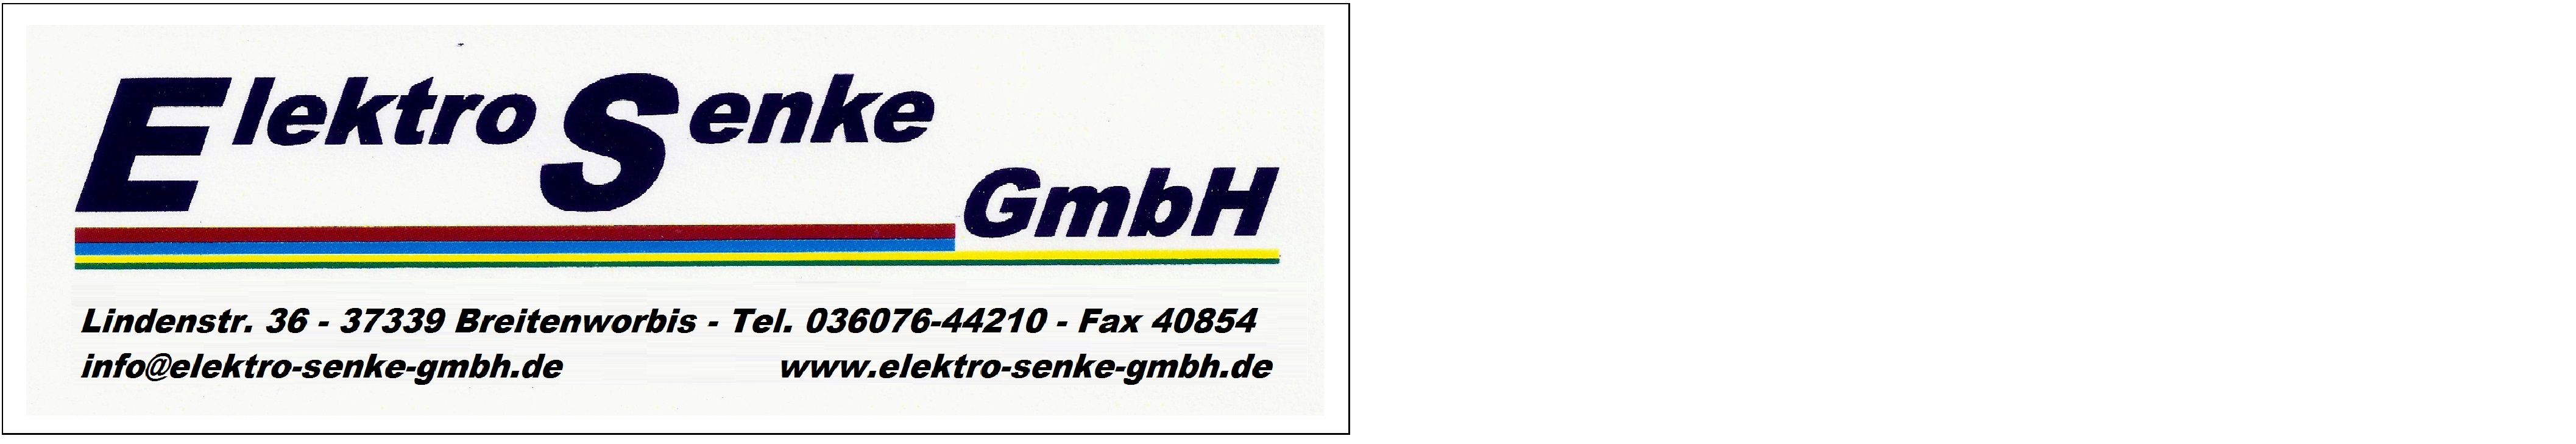 Elektro-Senke-GmbH0002 4